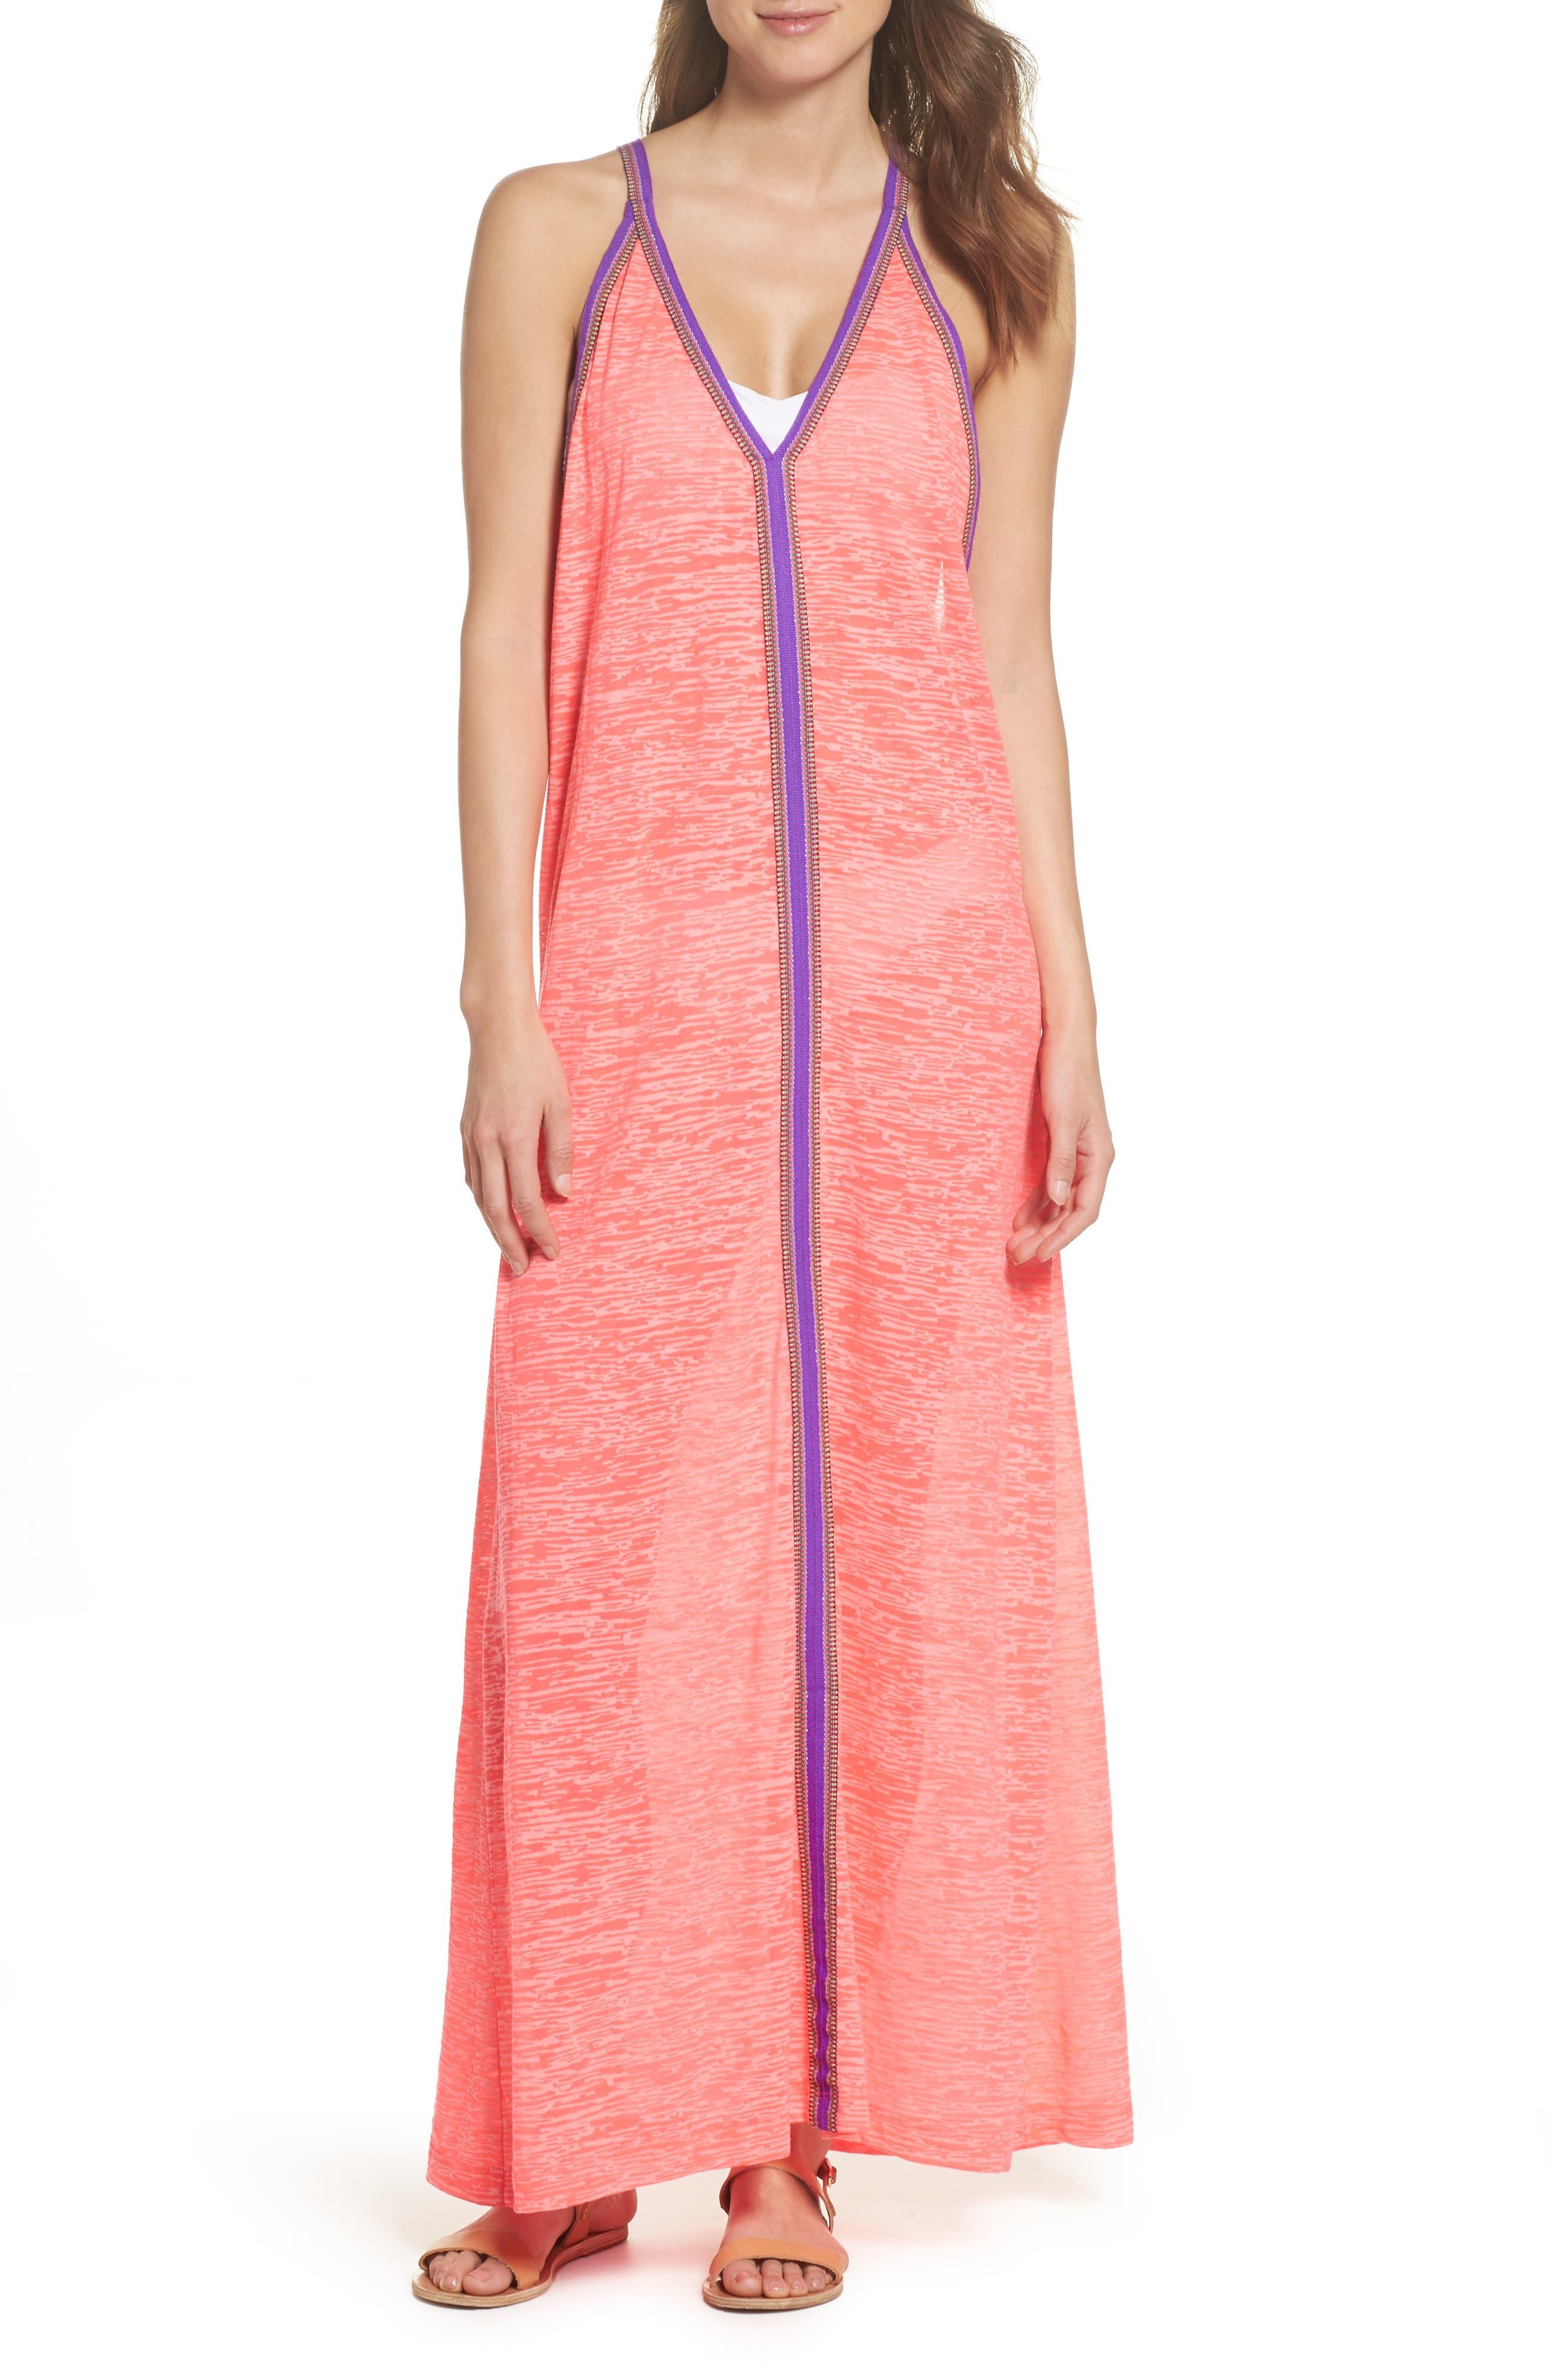 Inca Cover-Up Maxi Sundress,                             Main thumbnail 1, color,                             Hot Pink